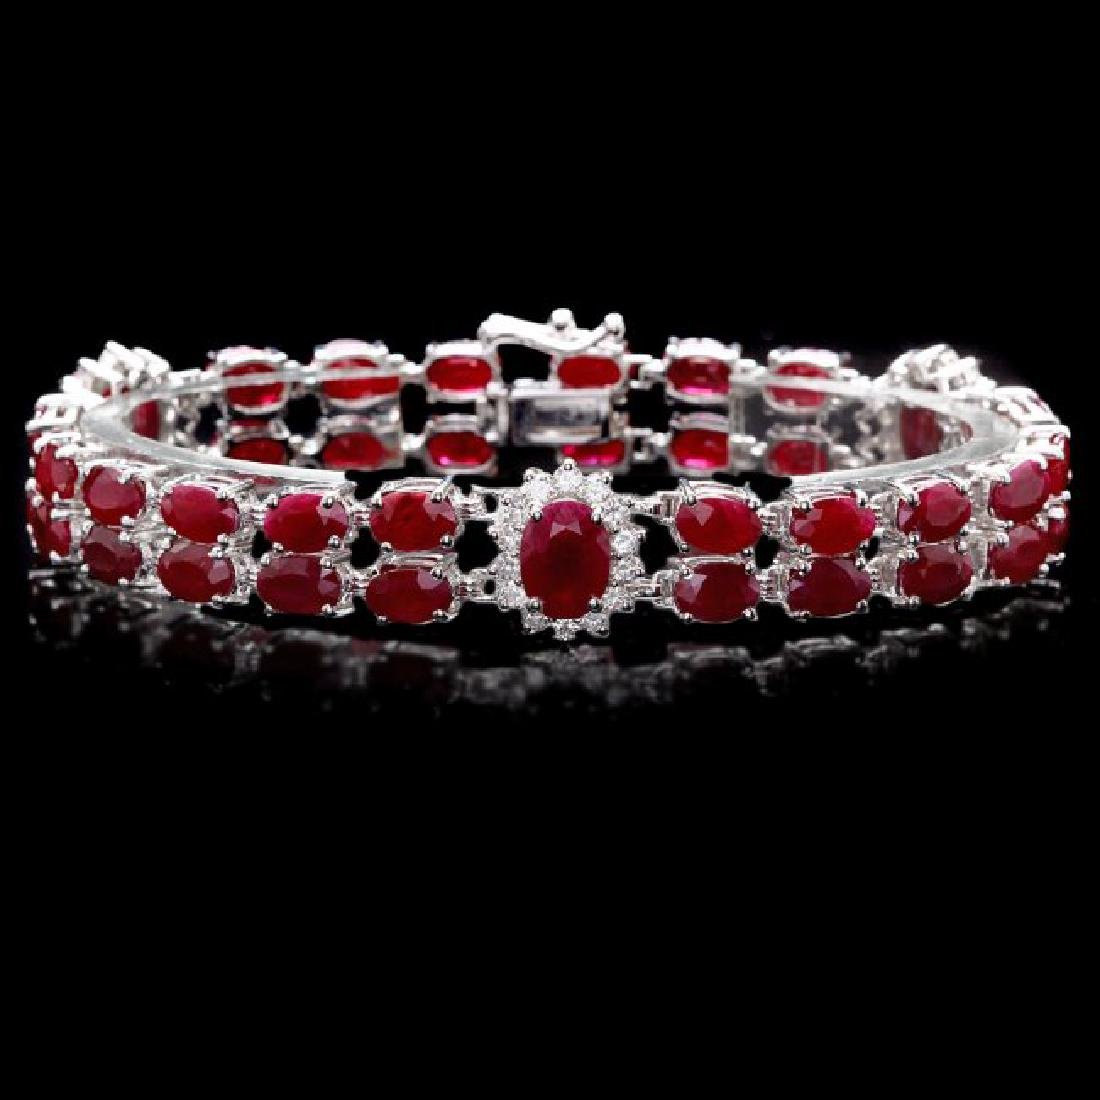 14k White Gold 22ct Ruby 1.30ct Diamond Bracelet